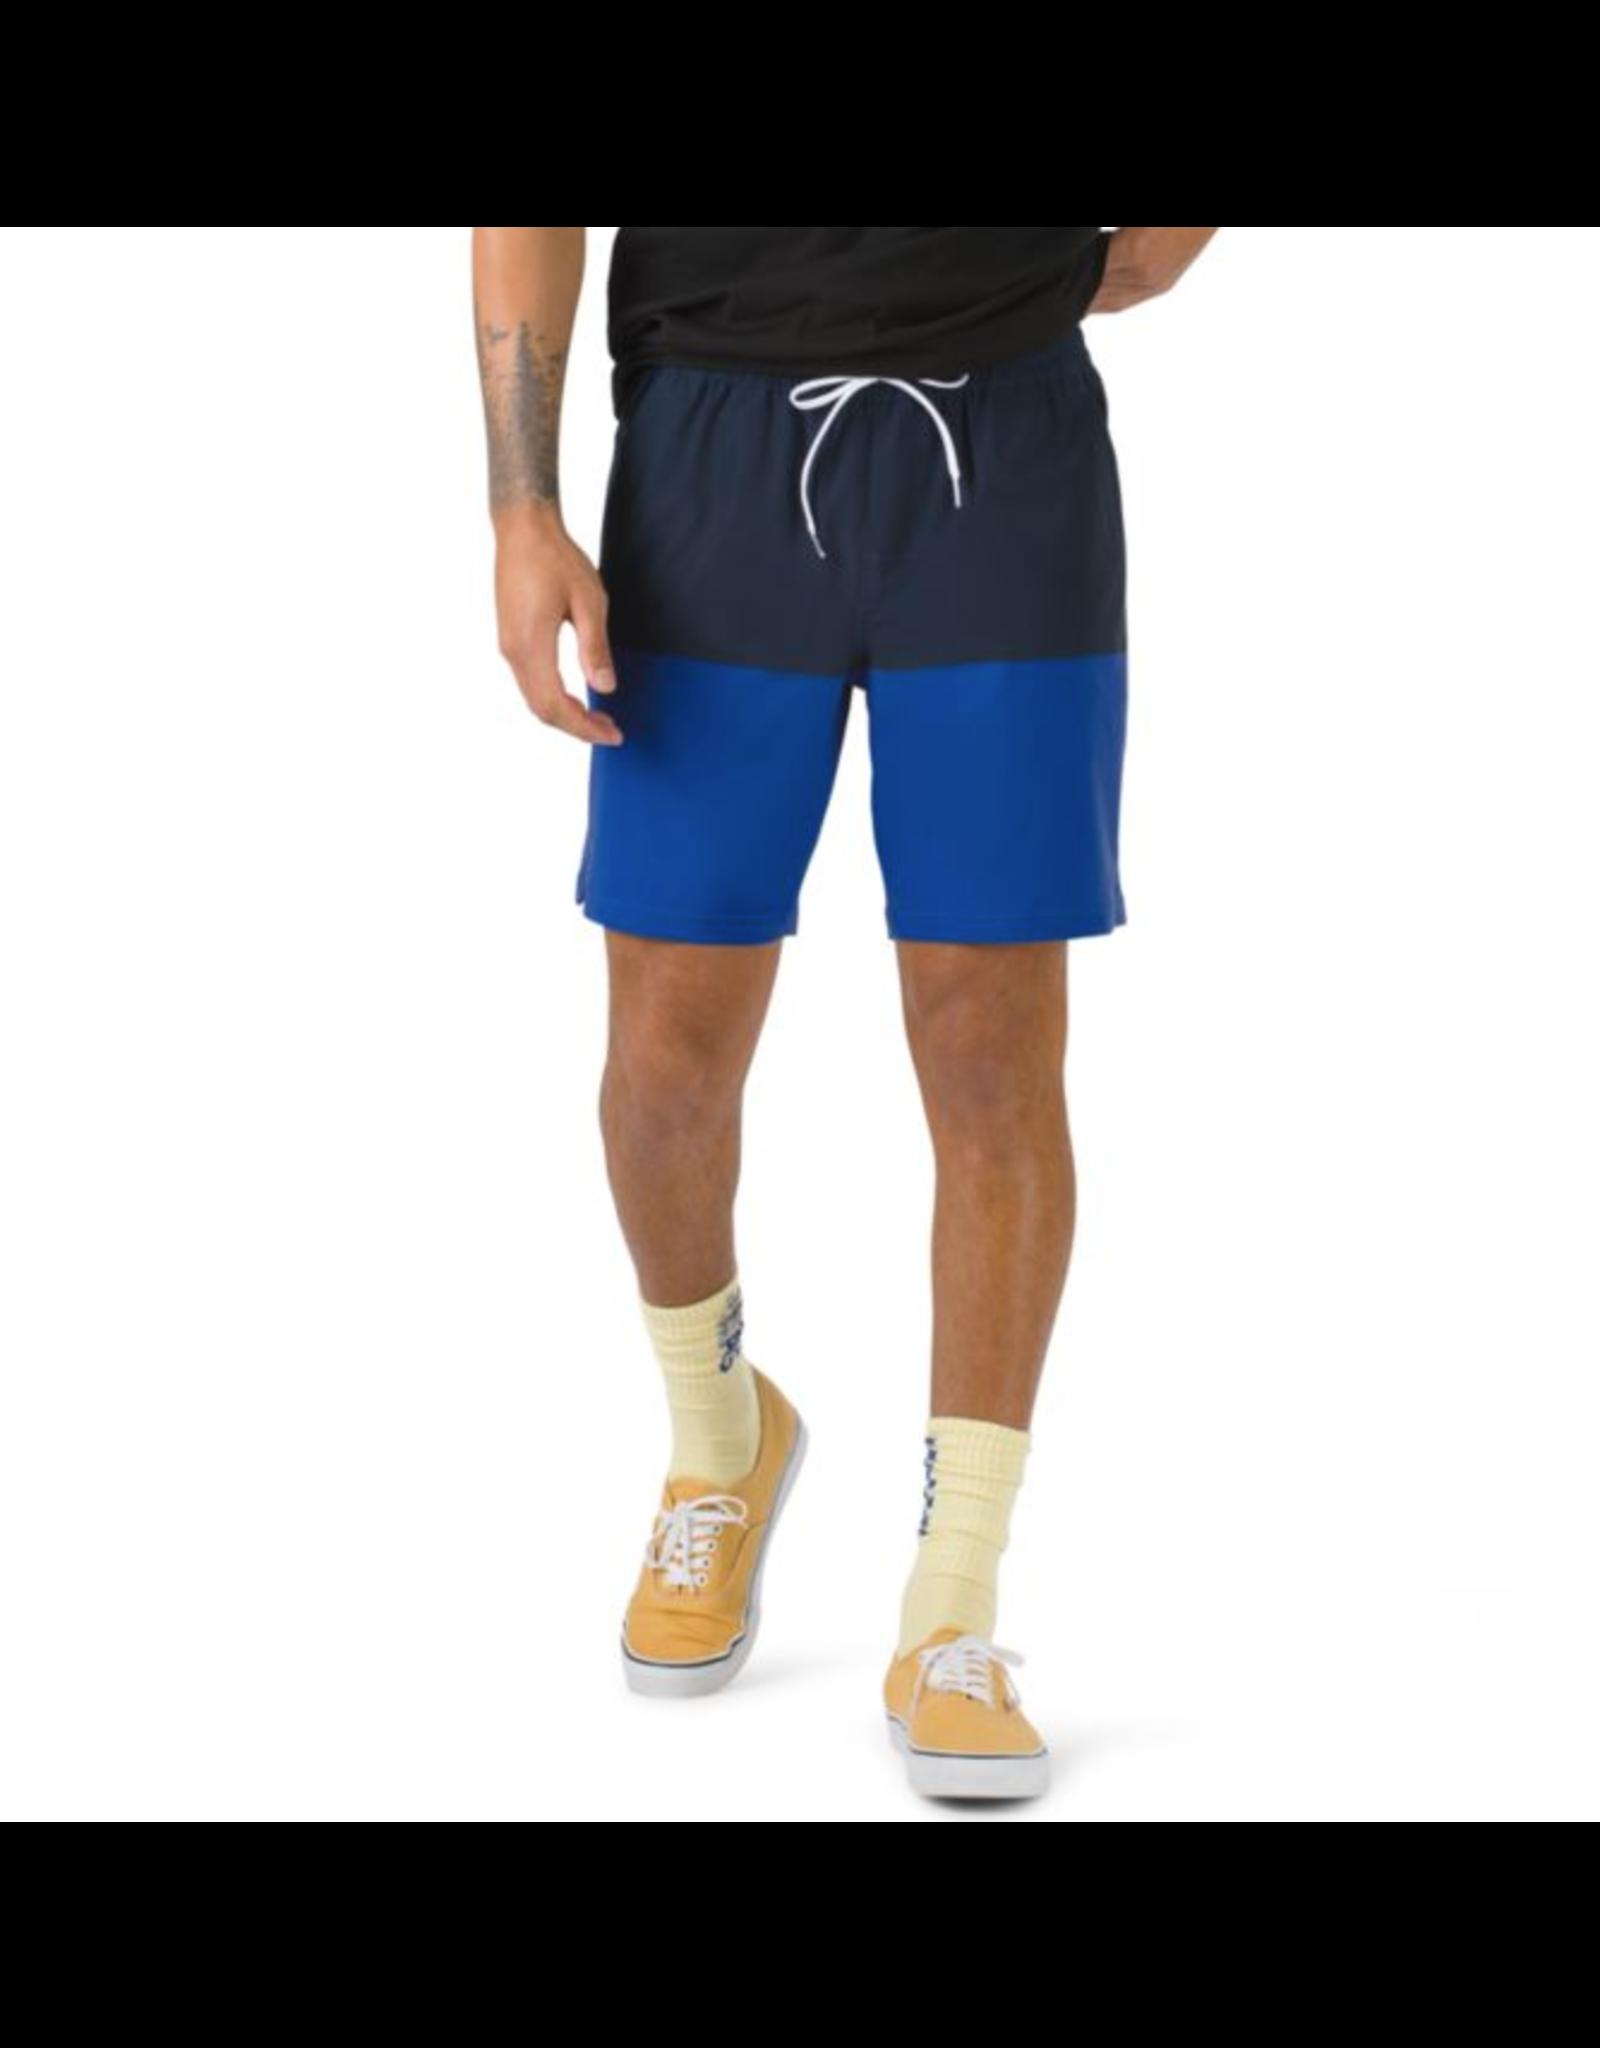 Vans Comfy Sport Short - Dress Blue/Marine